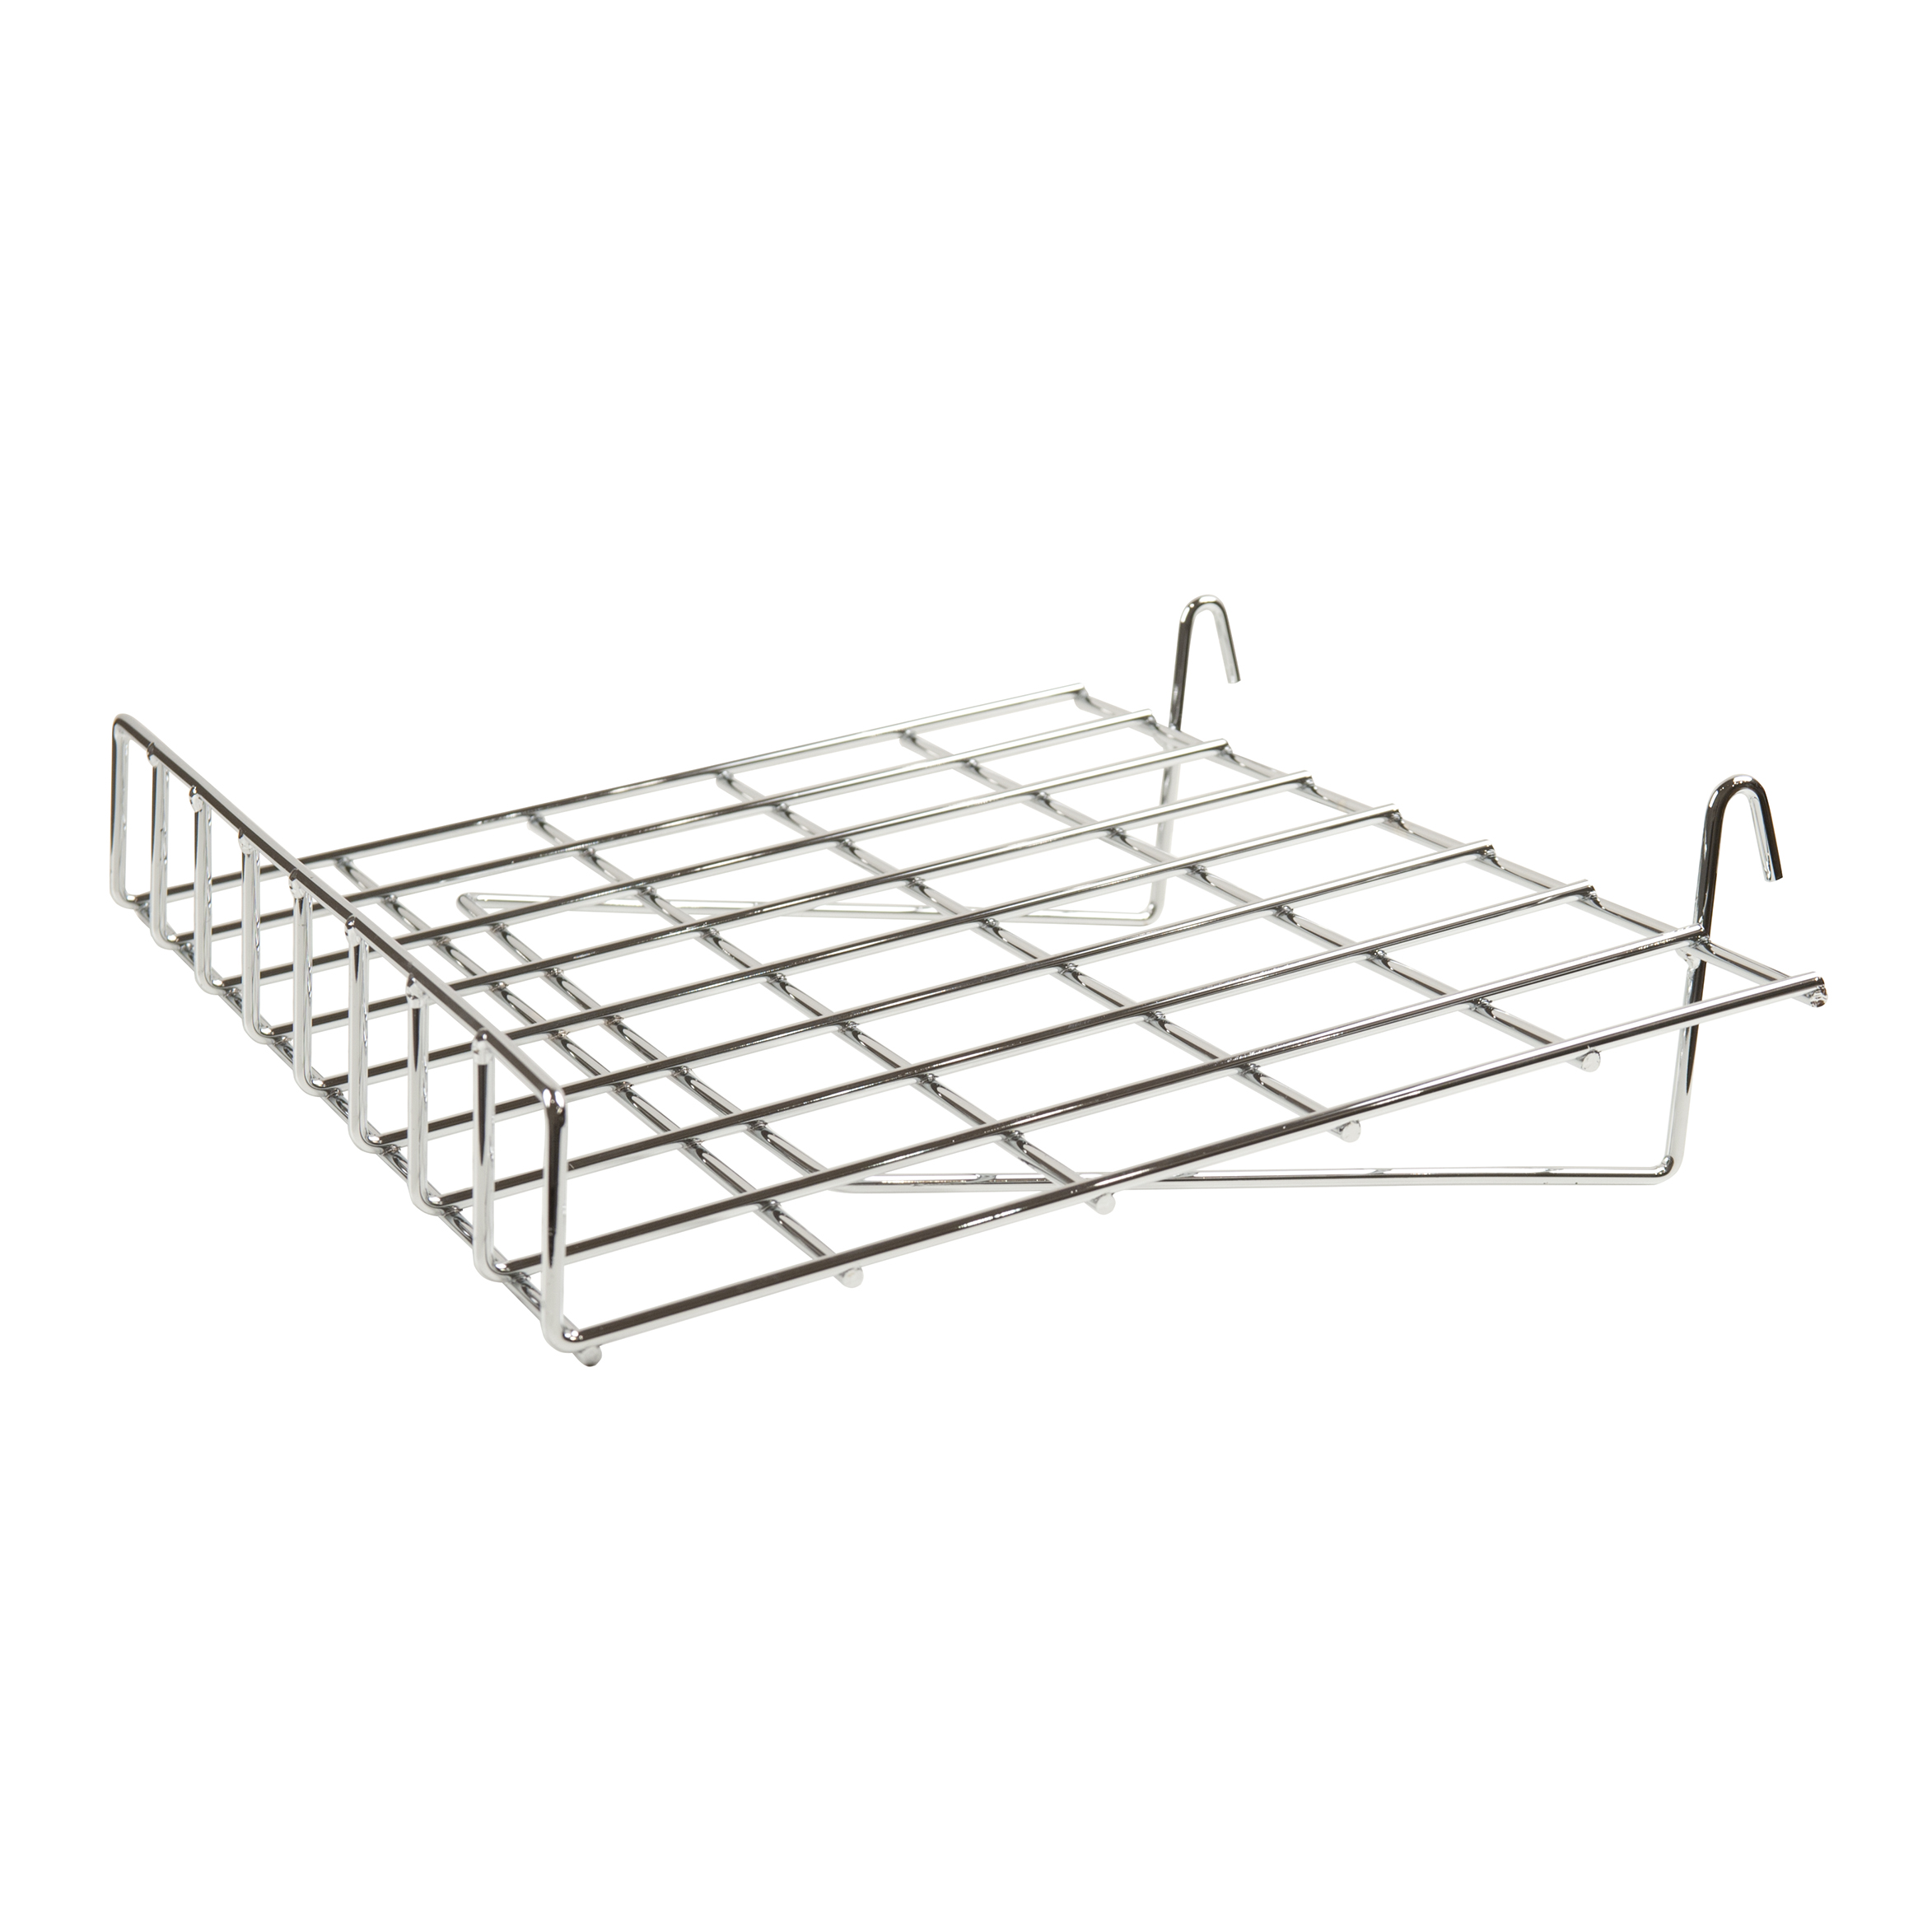 Gridwall And Slatgrid Baskets And Shelving